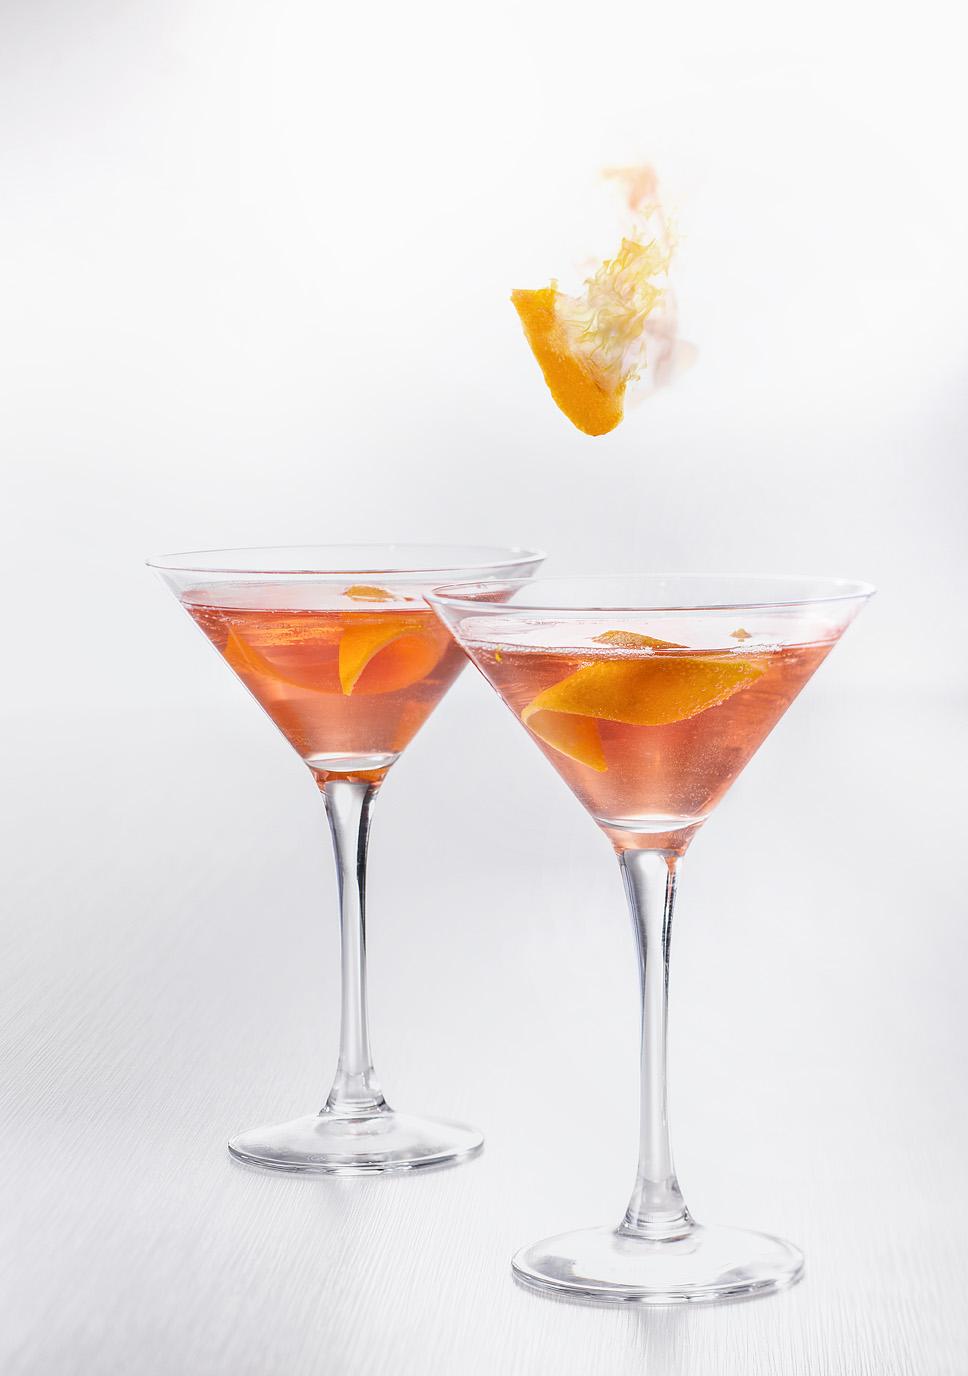 drinques sem álcool